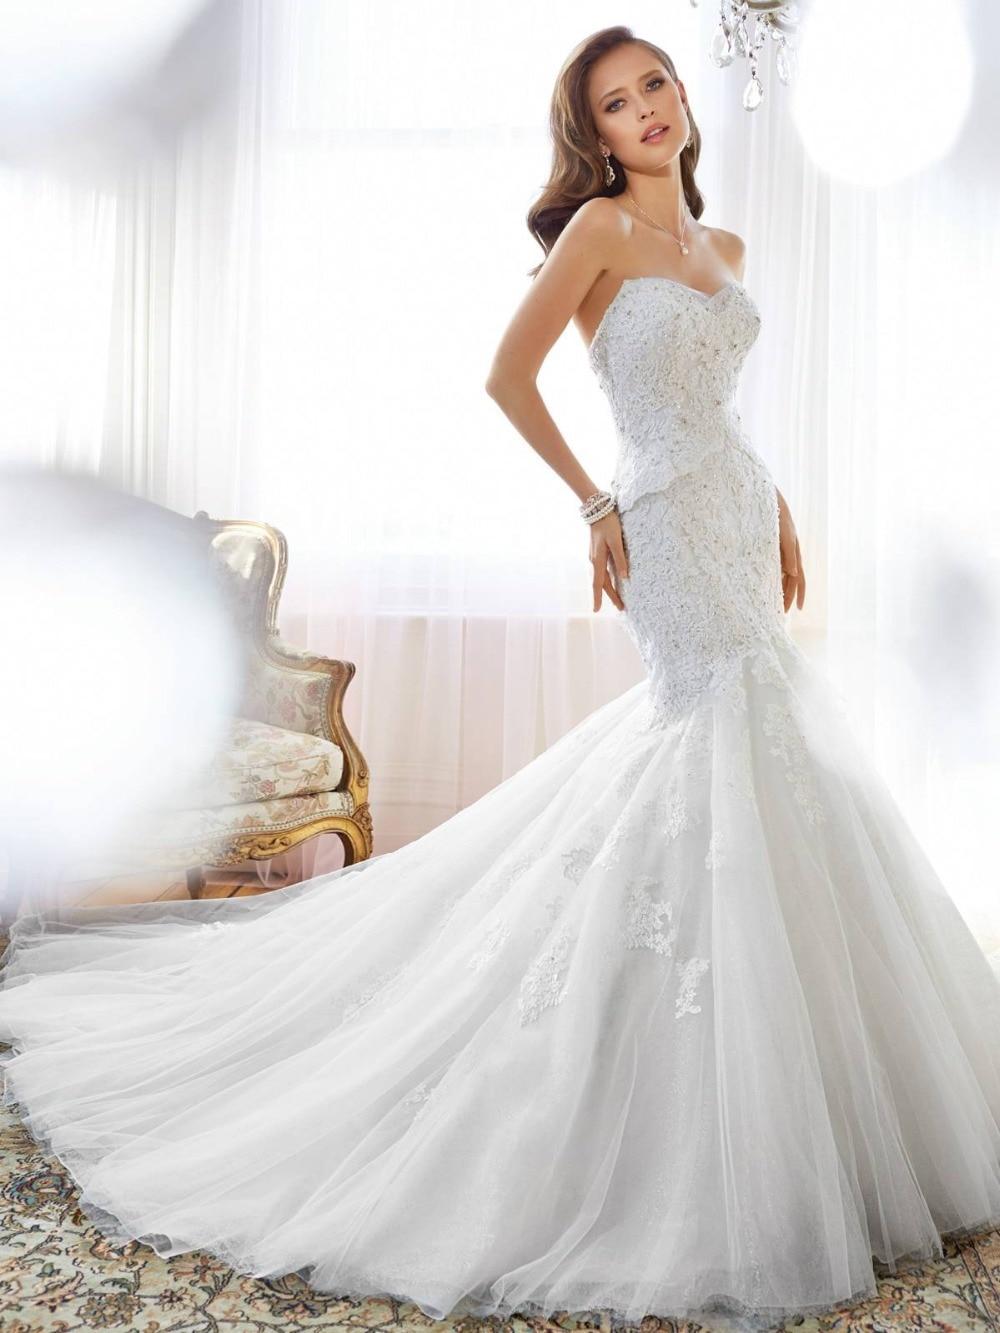 wedding dresses ball gown sweetheart neckline sweetheart neckline wedding dress Wedding Dresses Ball Gown Sweetheart Neckline 13